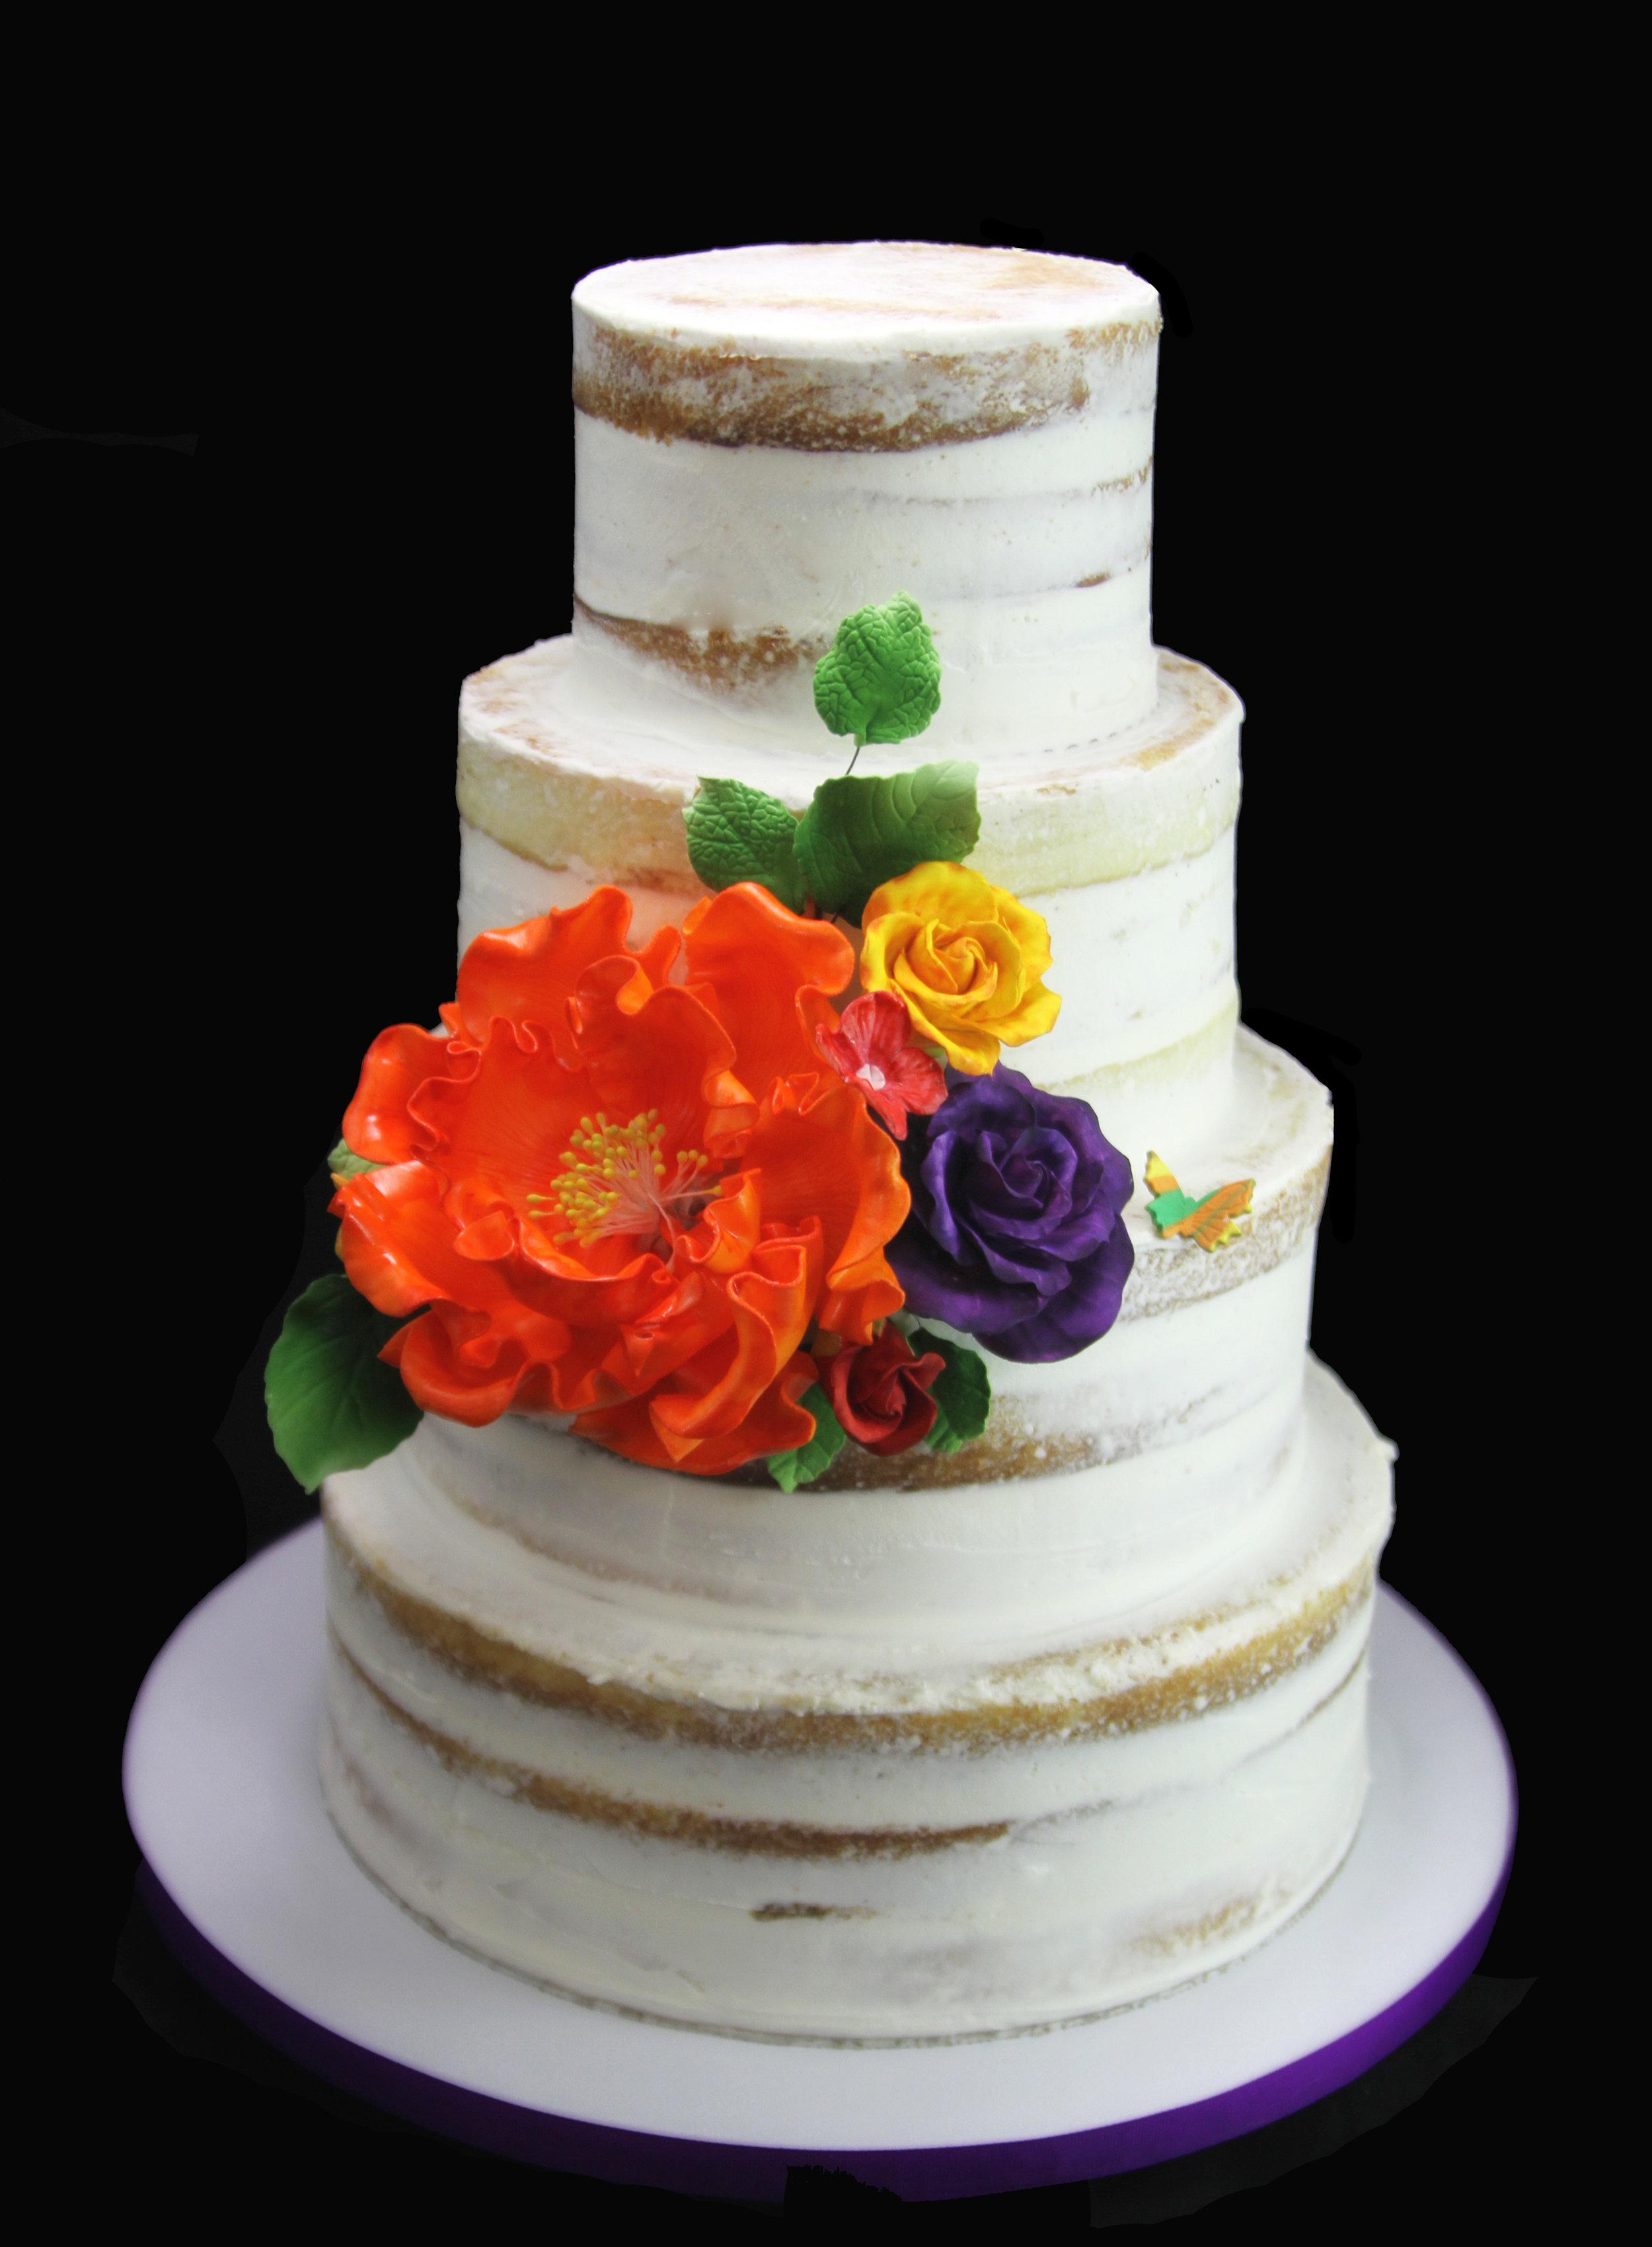 Crumb Coat Wedding Cake with Large Peony.jpg